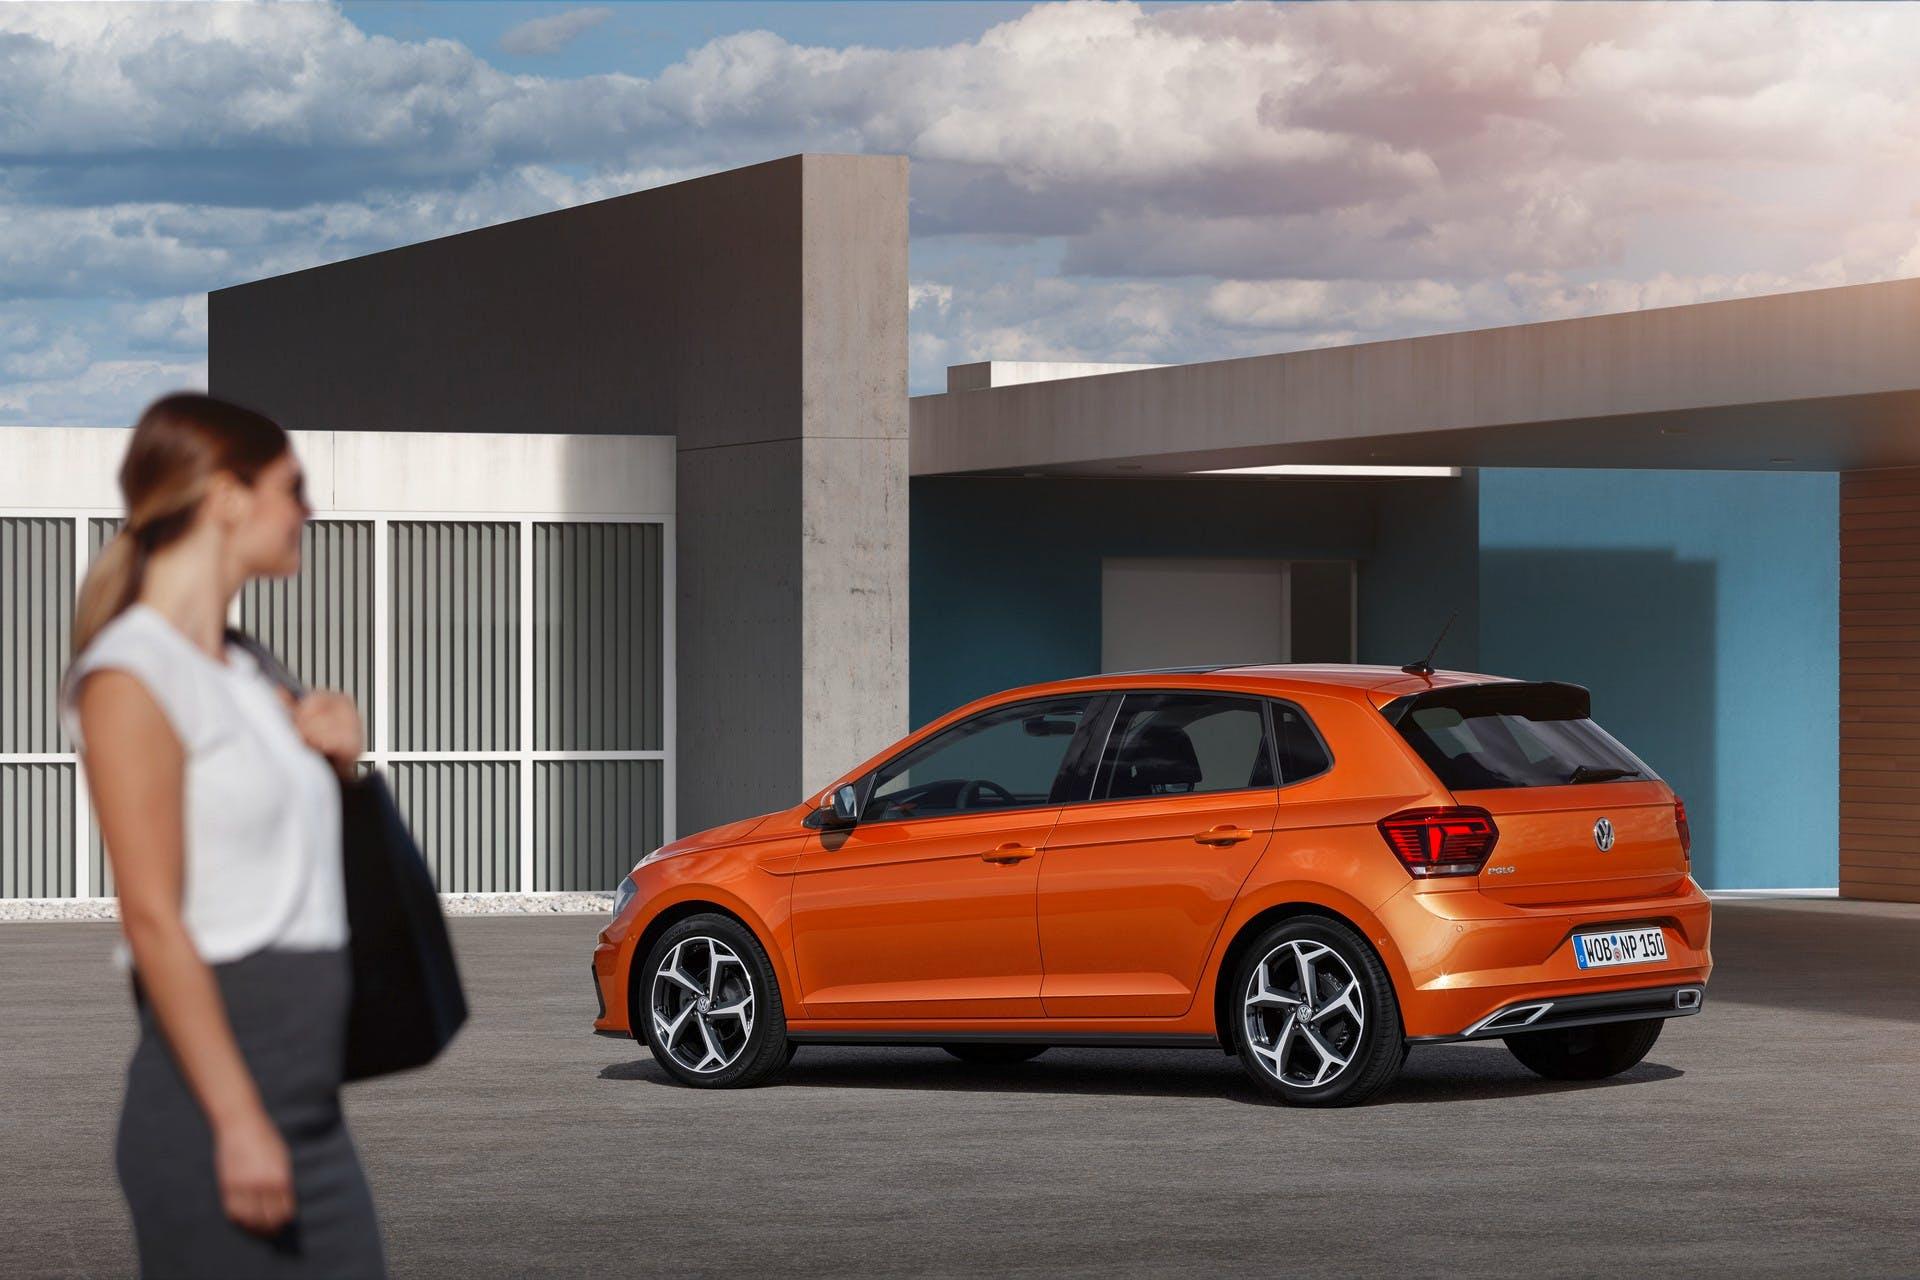 Volkswagen polo color arancio vista da dietro